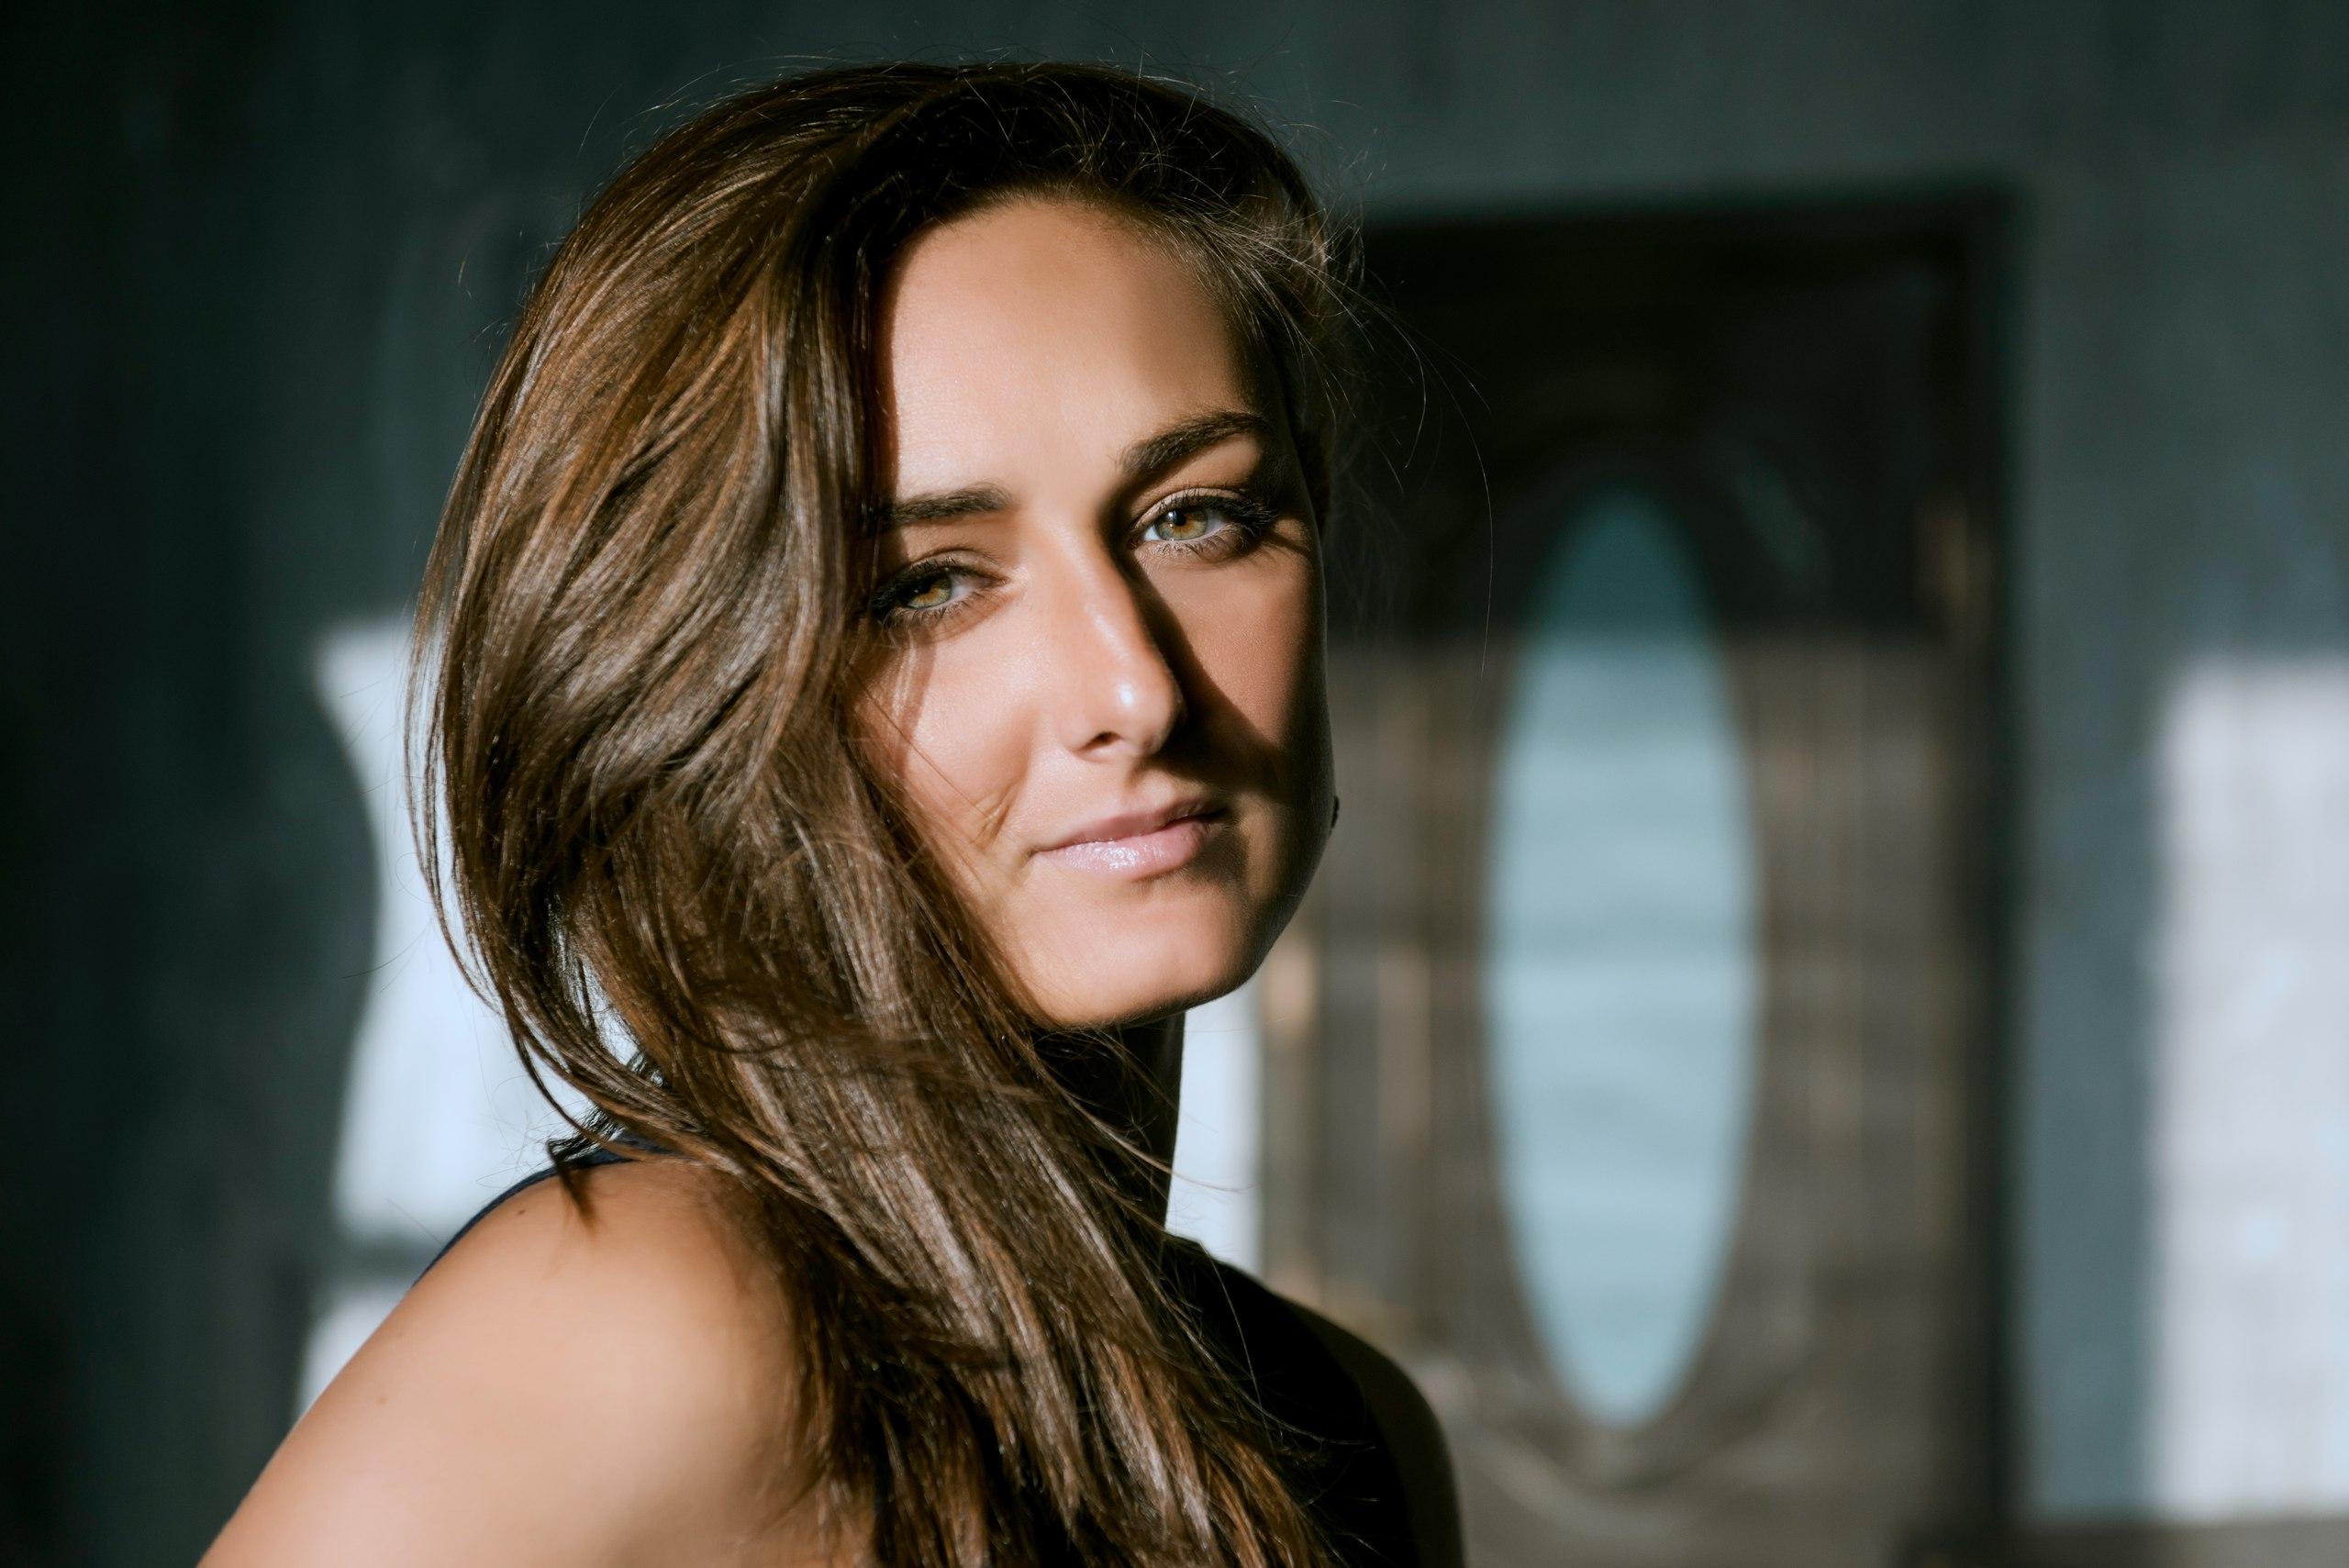 Alina Sankalpas, композитор и автор проекта SATTVA PROJECT